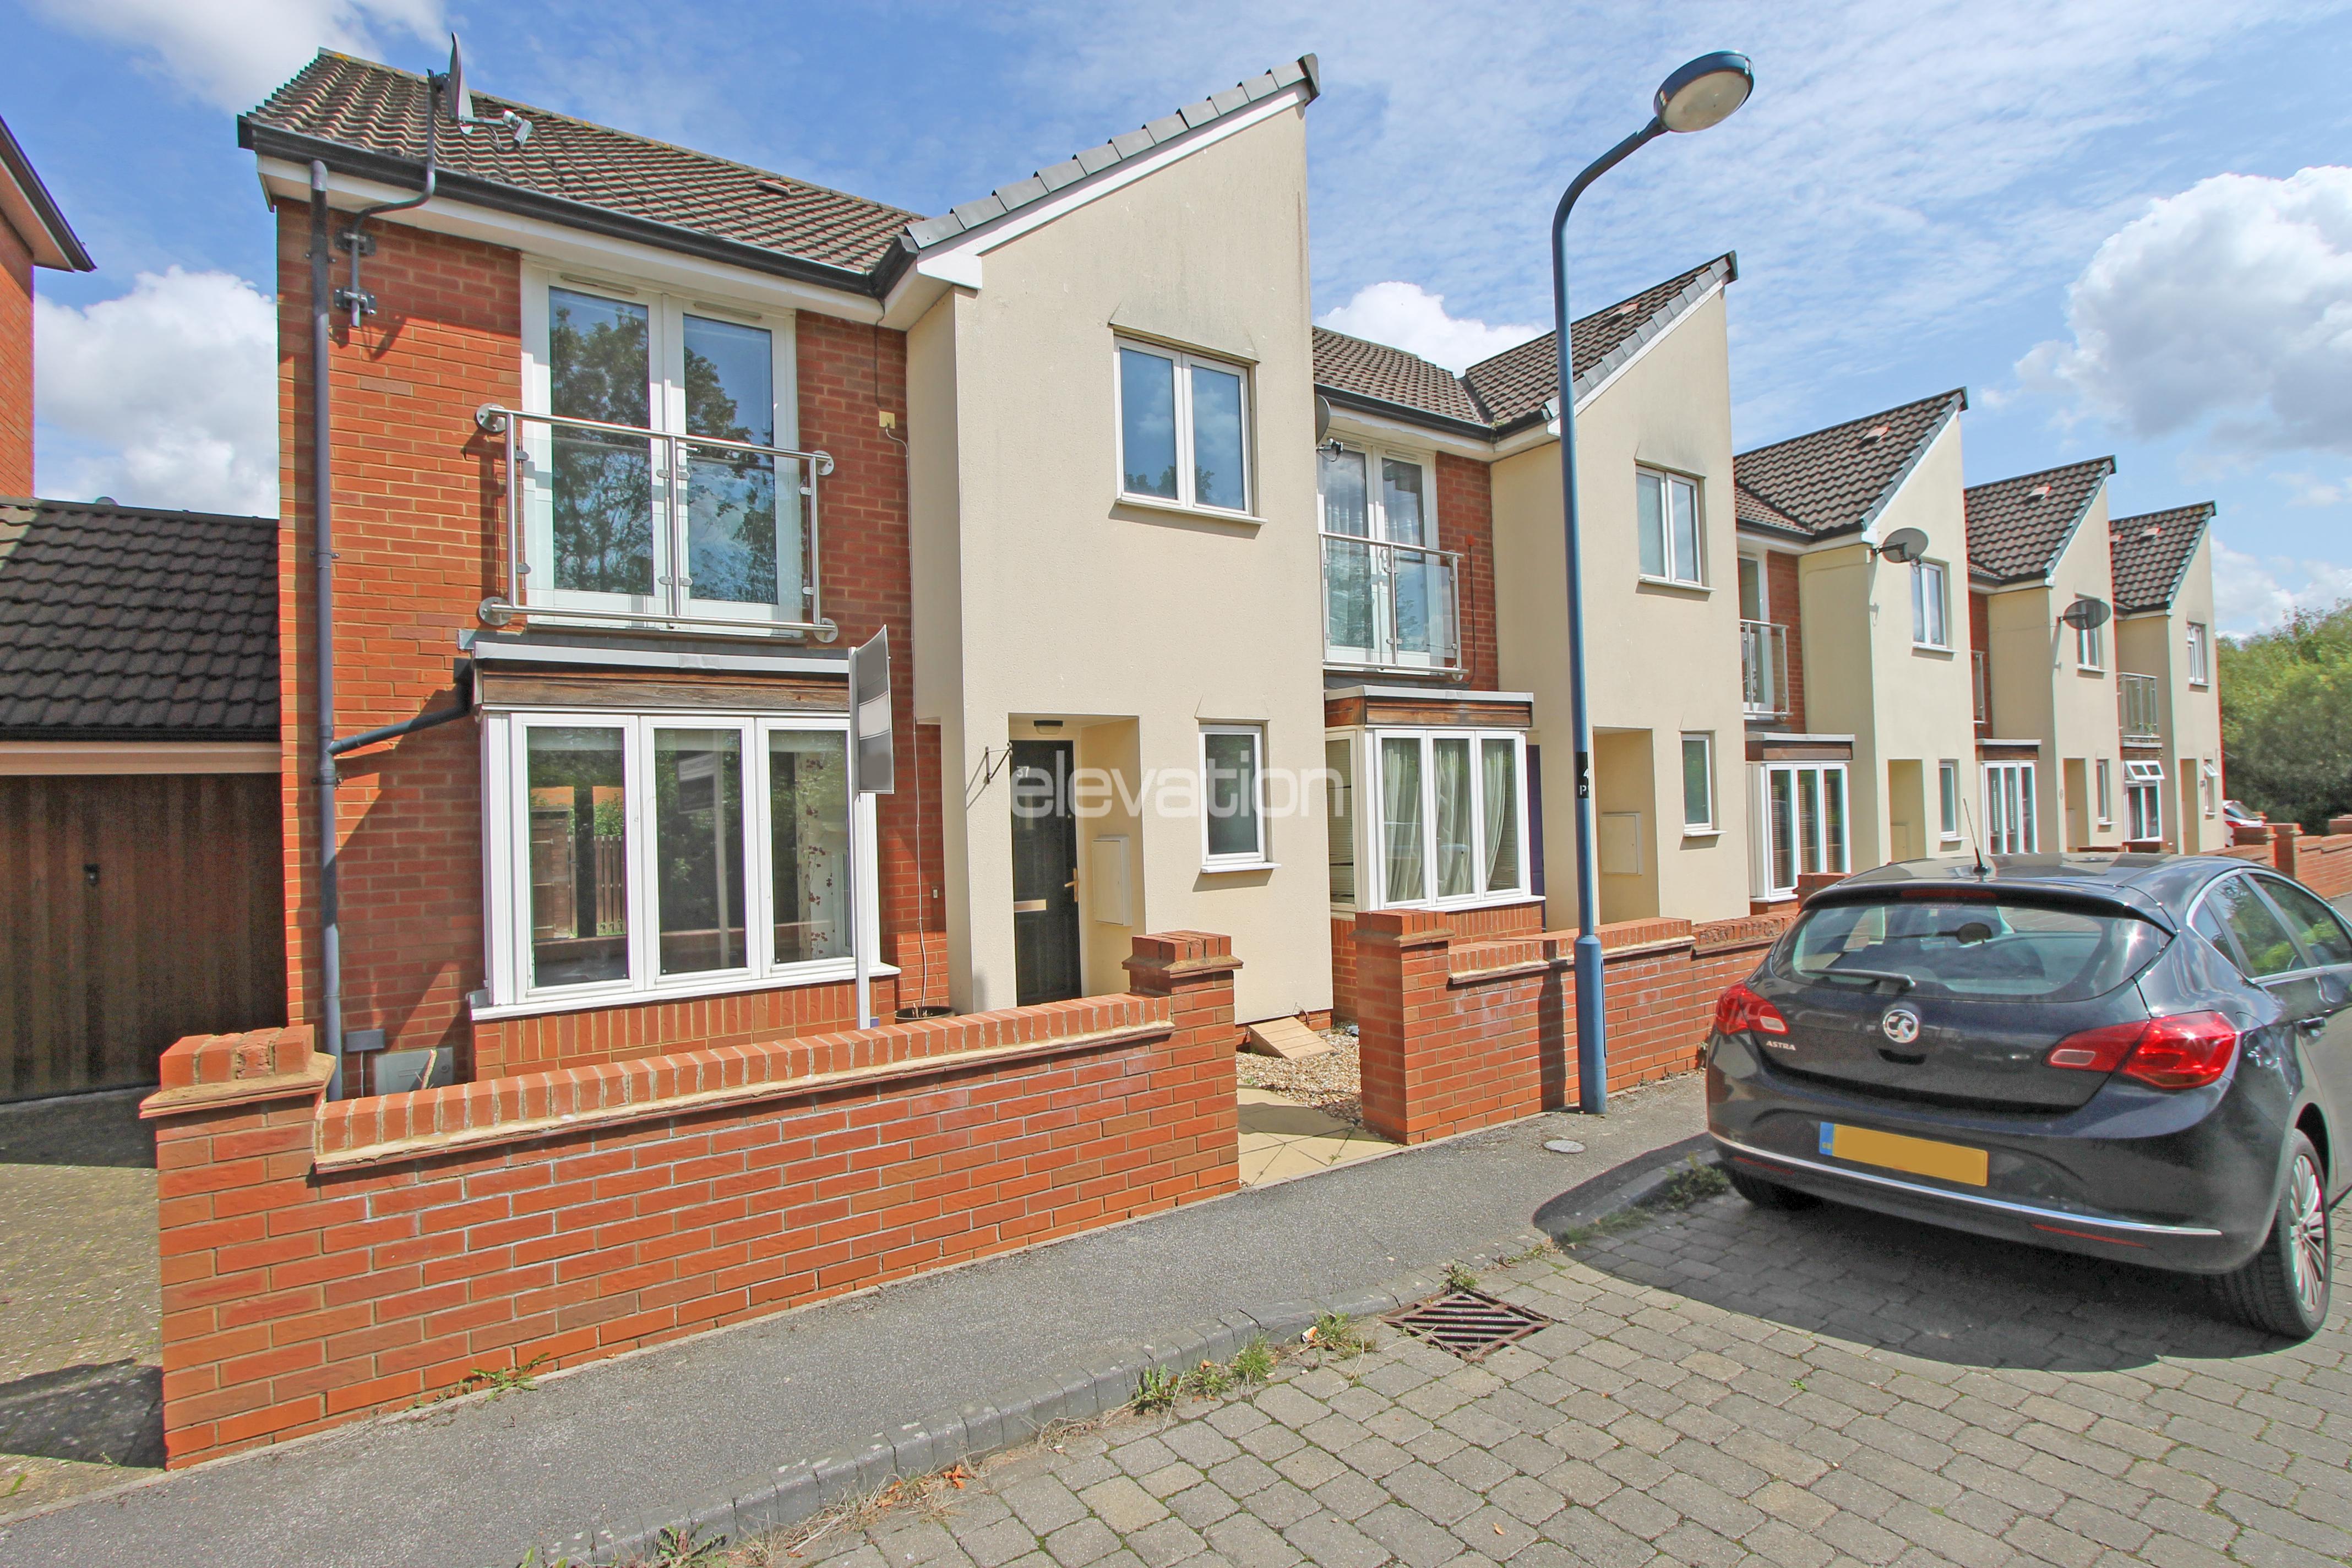 Hunsbury Chase, Milton Keynes, Buckinghamshire Image